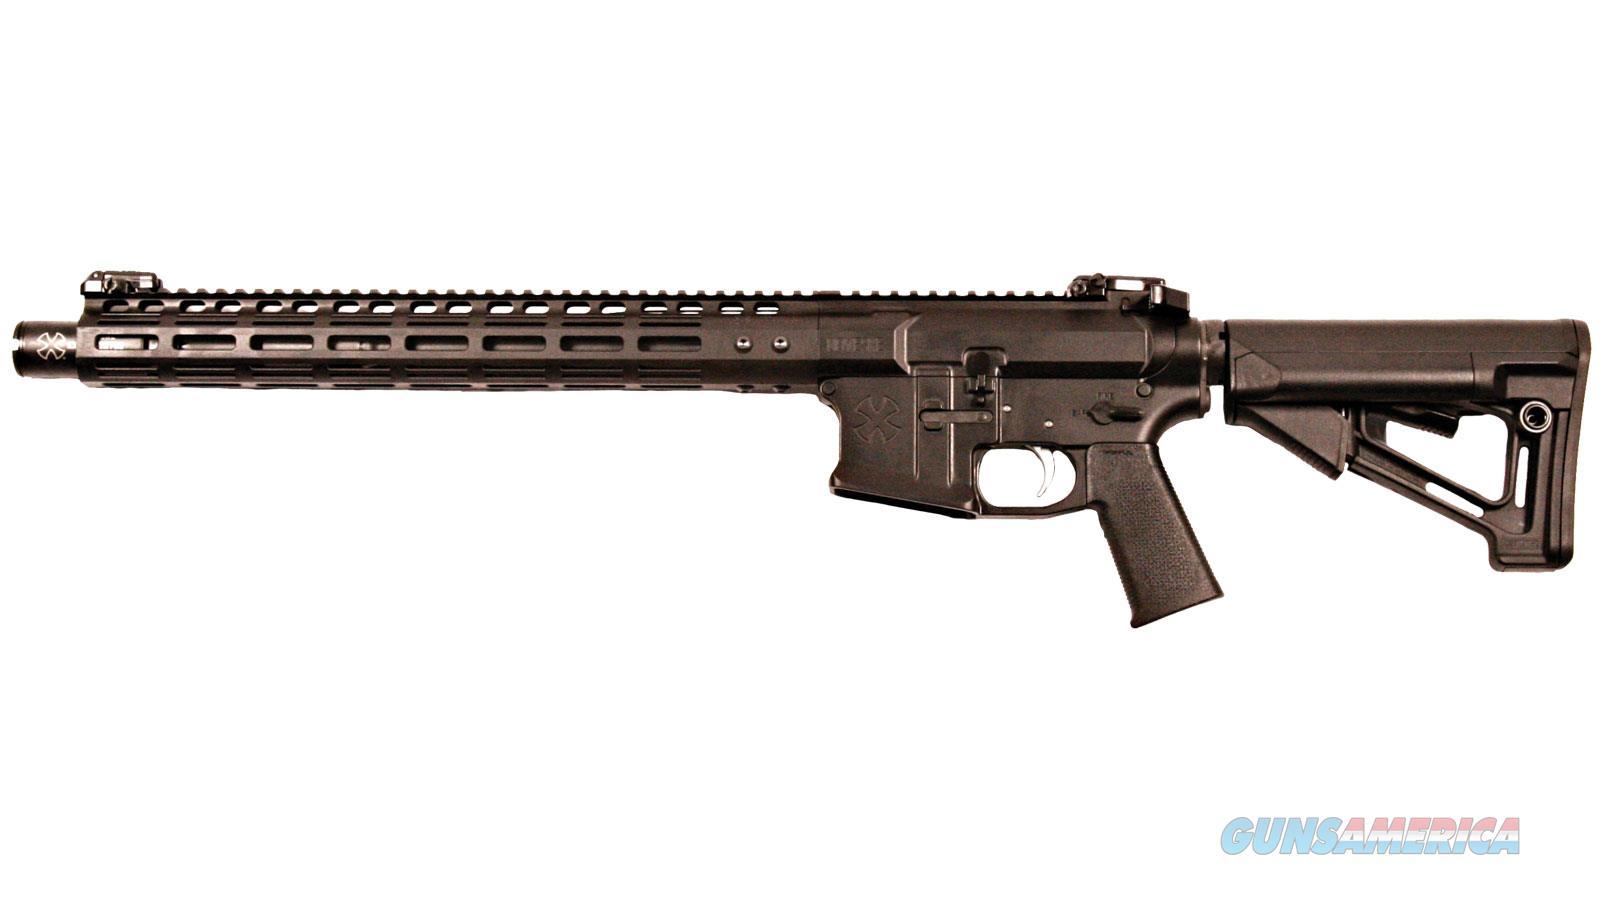 "Noveske Rifleworks Llc Geniii 13.7"" Nsr-15 M-Lok 02000420  Guns > Rifles > MN Misc Rifles"